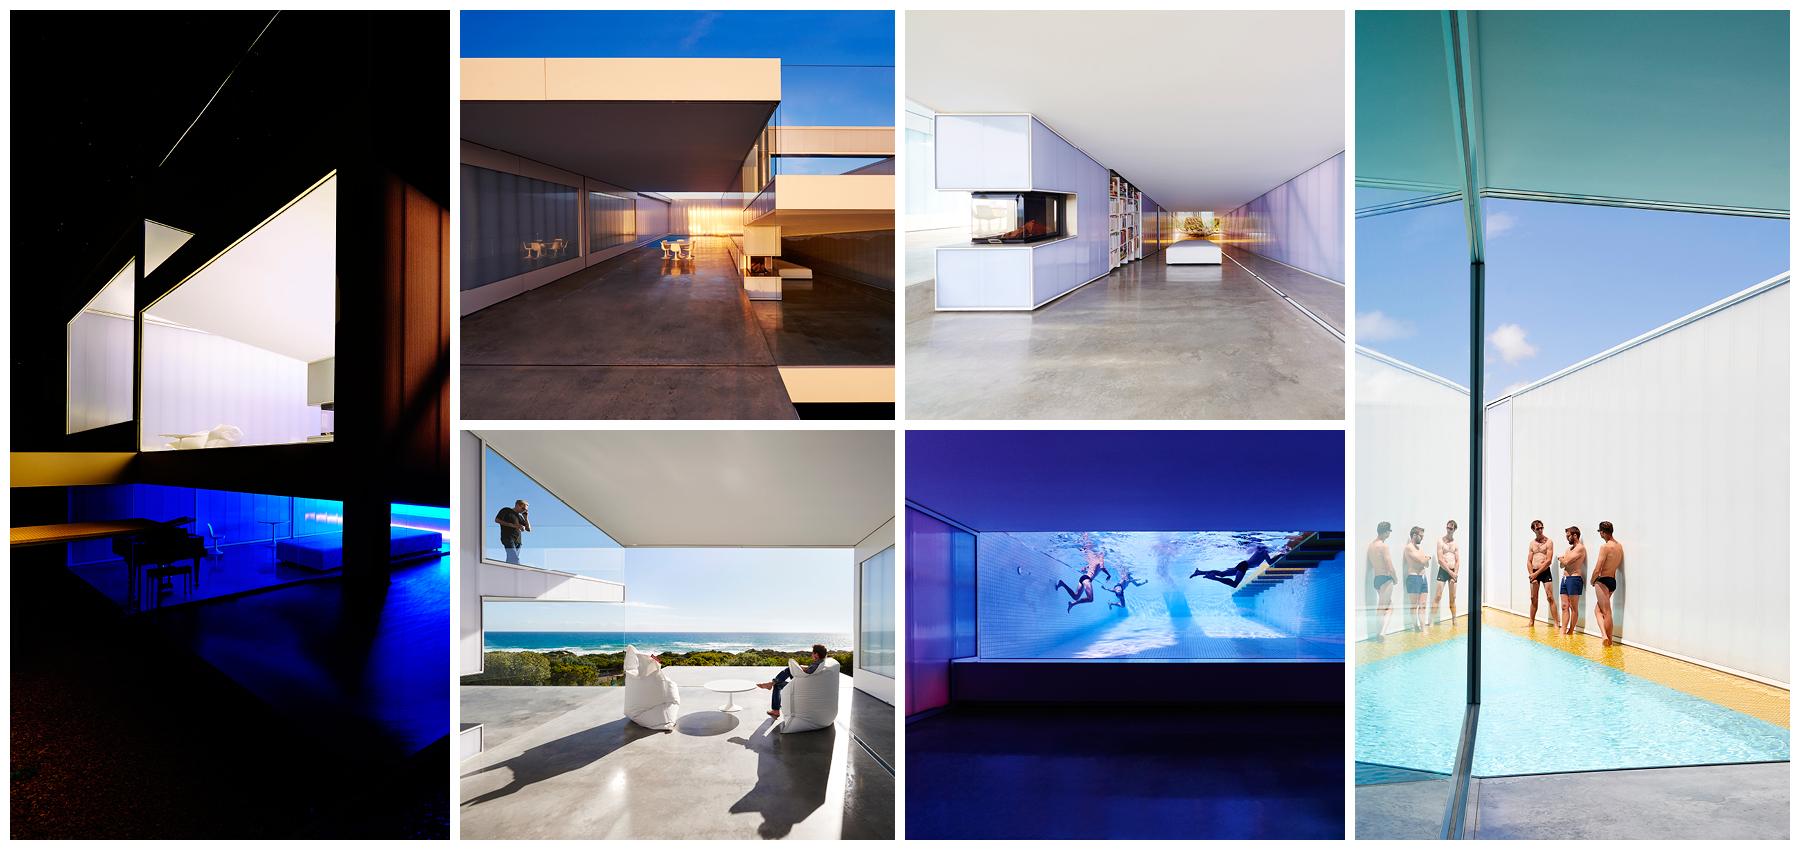 Villa Marittima by Robin Williams Architect. Photography: Dean Bradley.